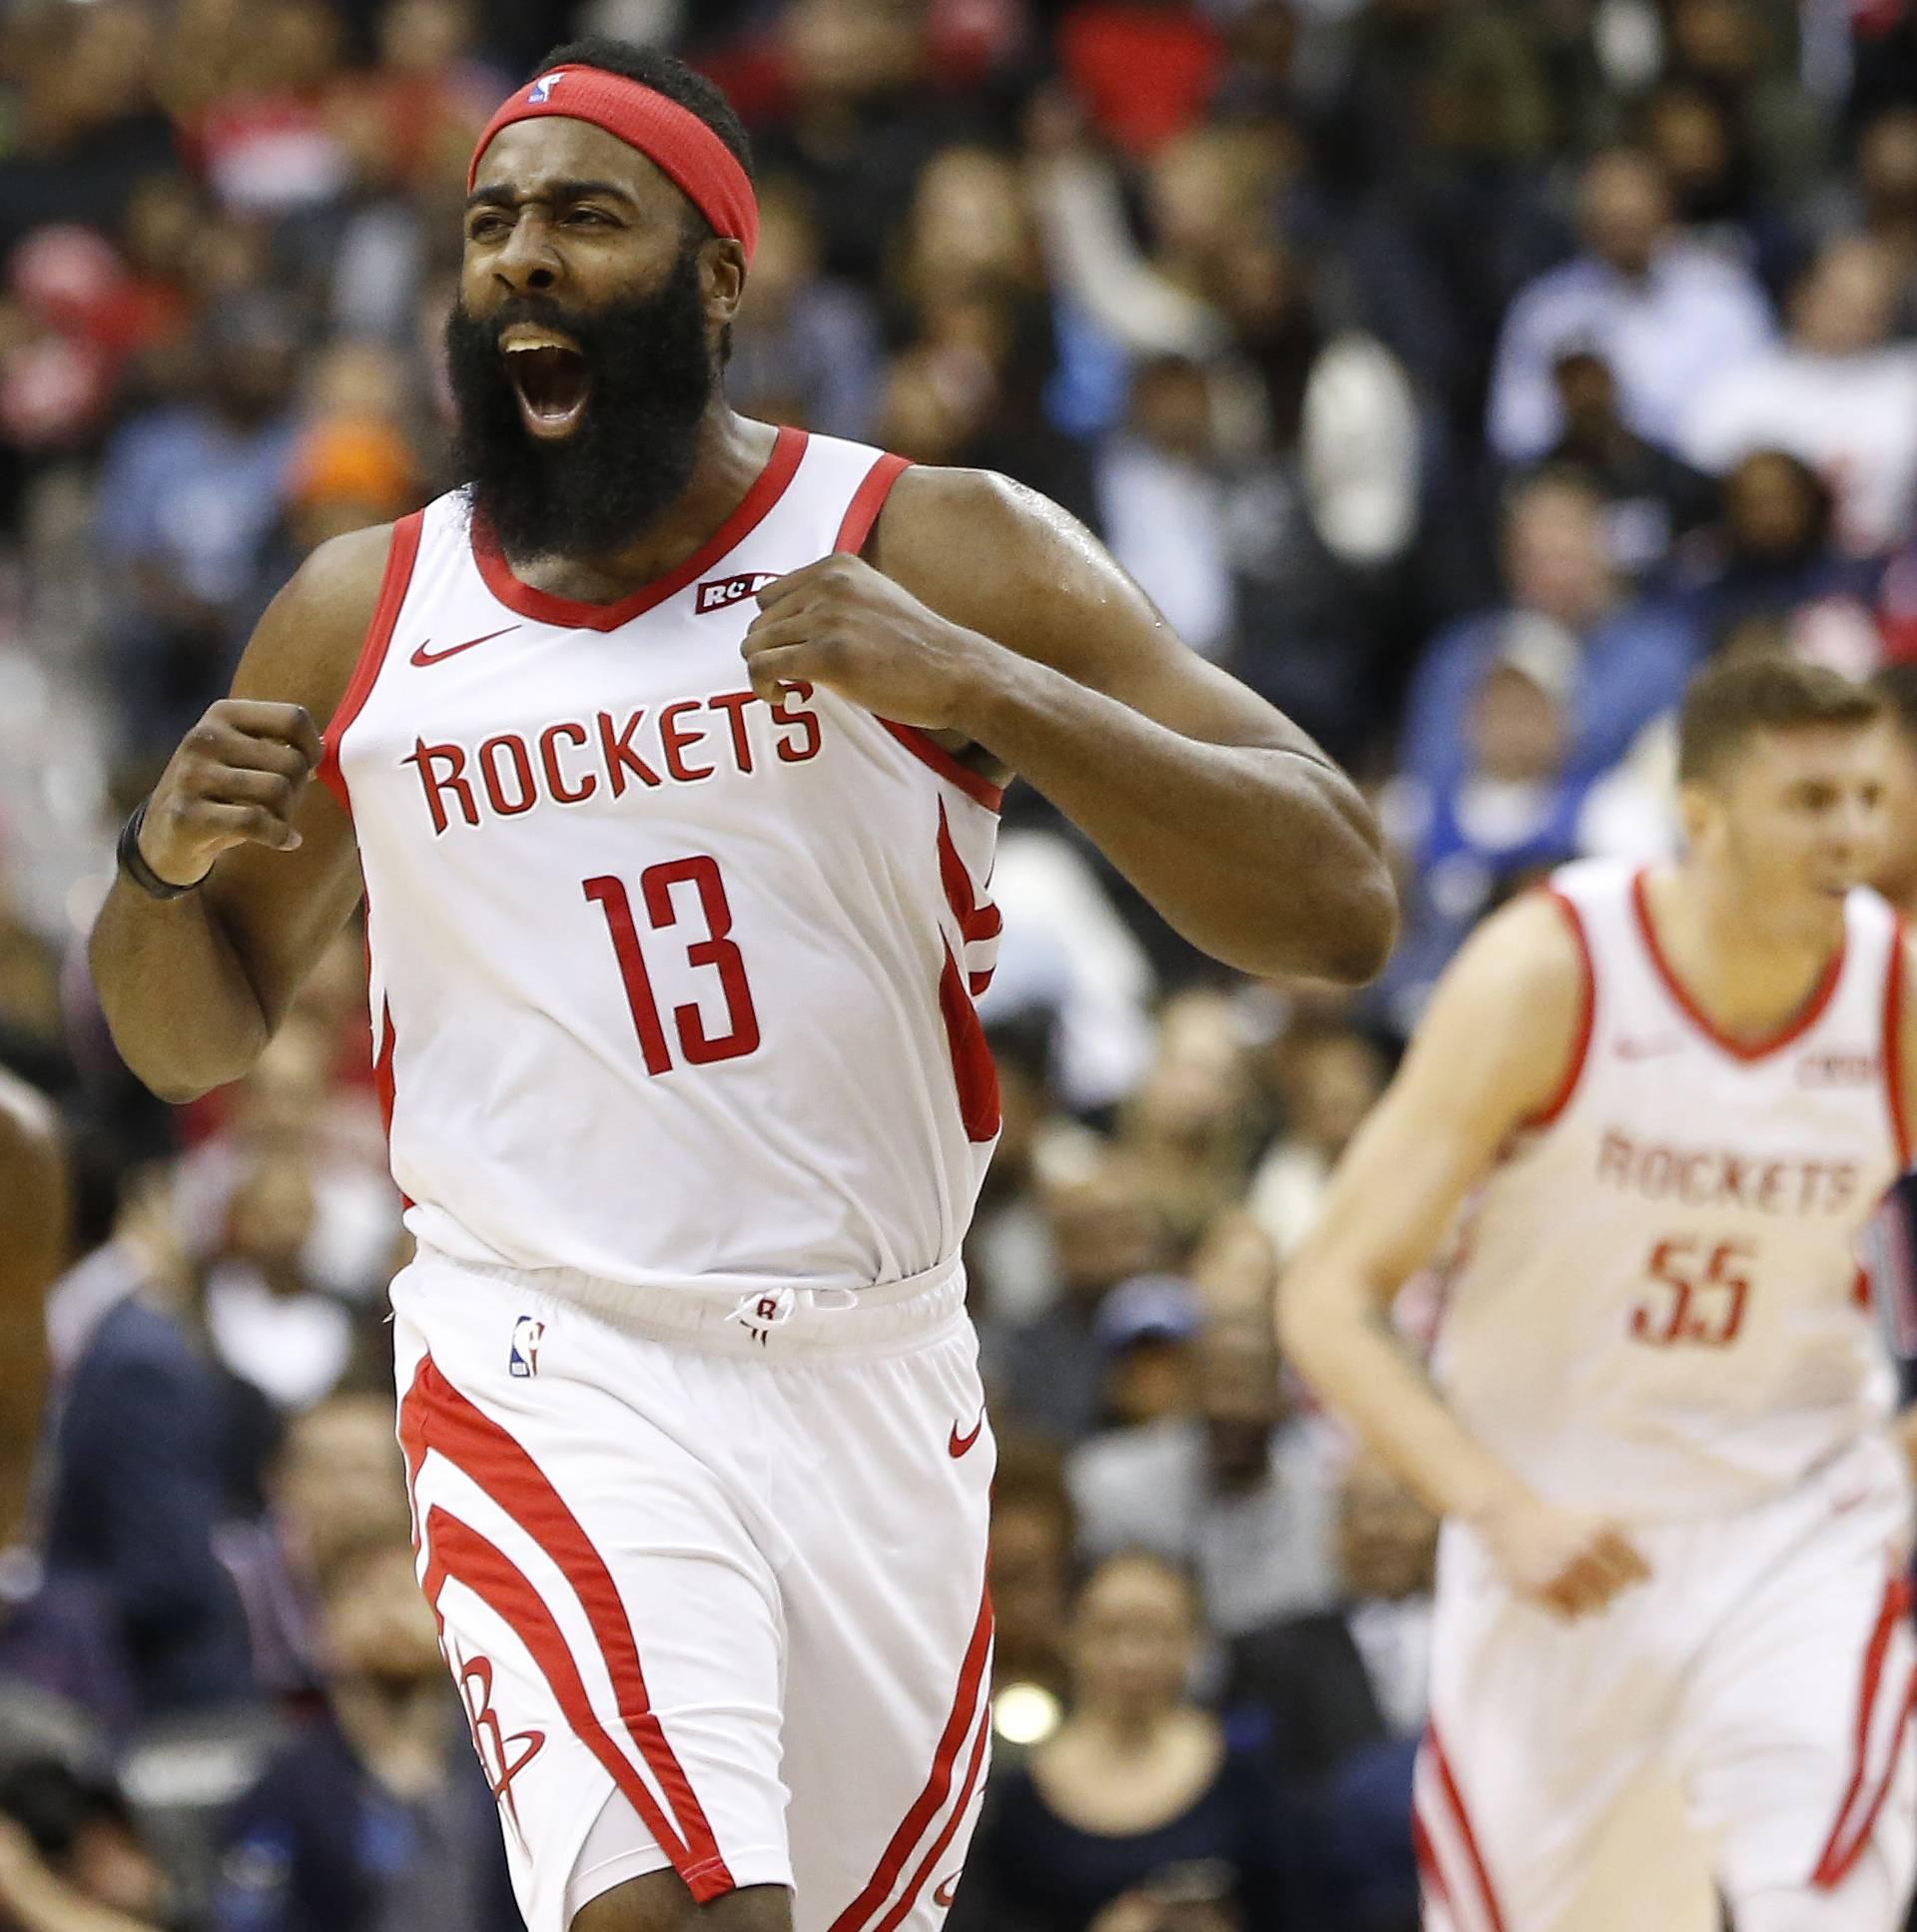 NBA: Houston Rockets at Washington Wizards